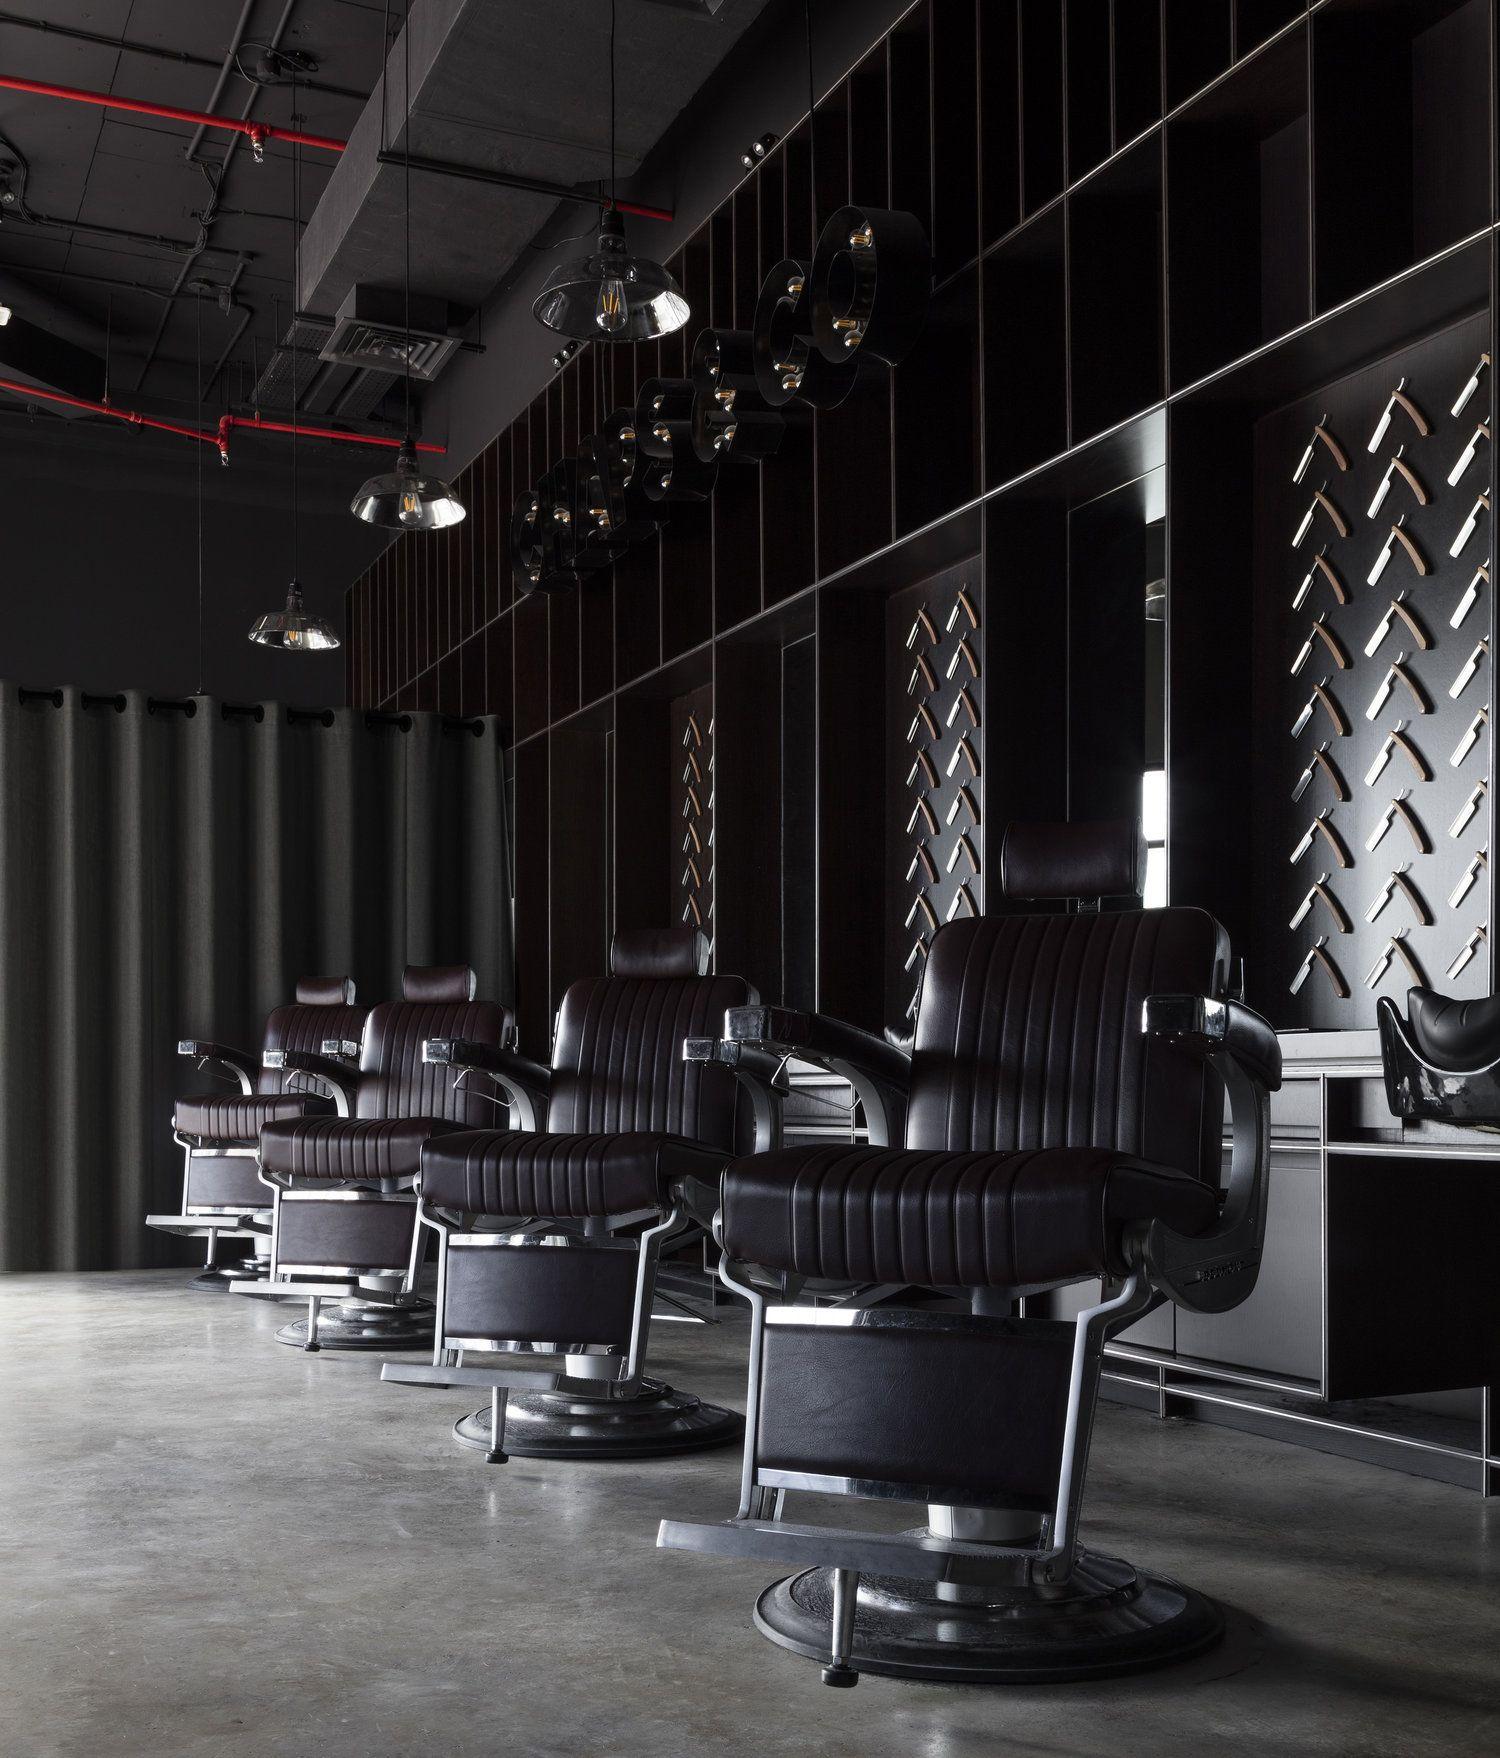 18+ For hommes salon de coiffure manosque idees en 2021